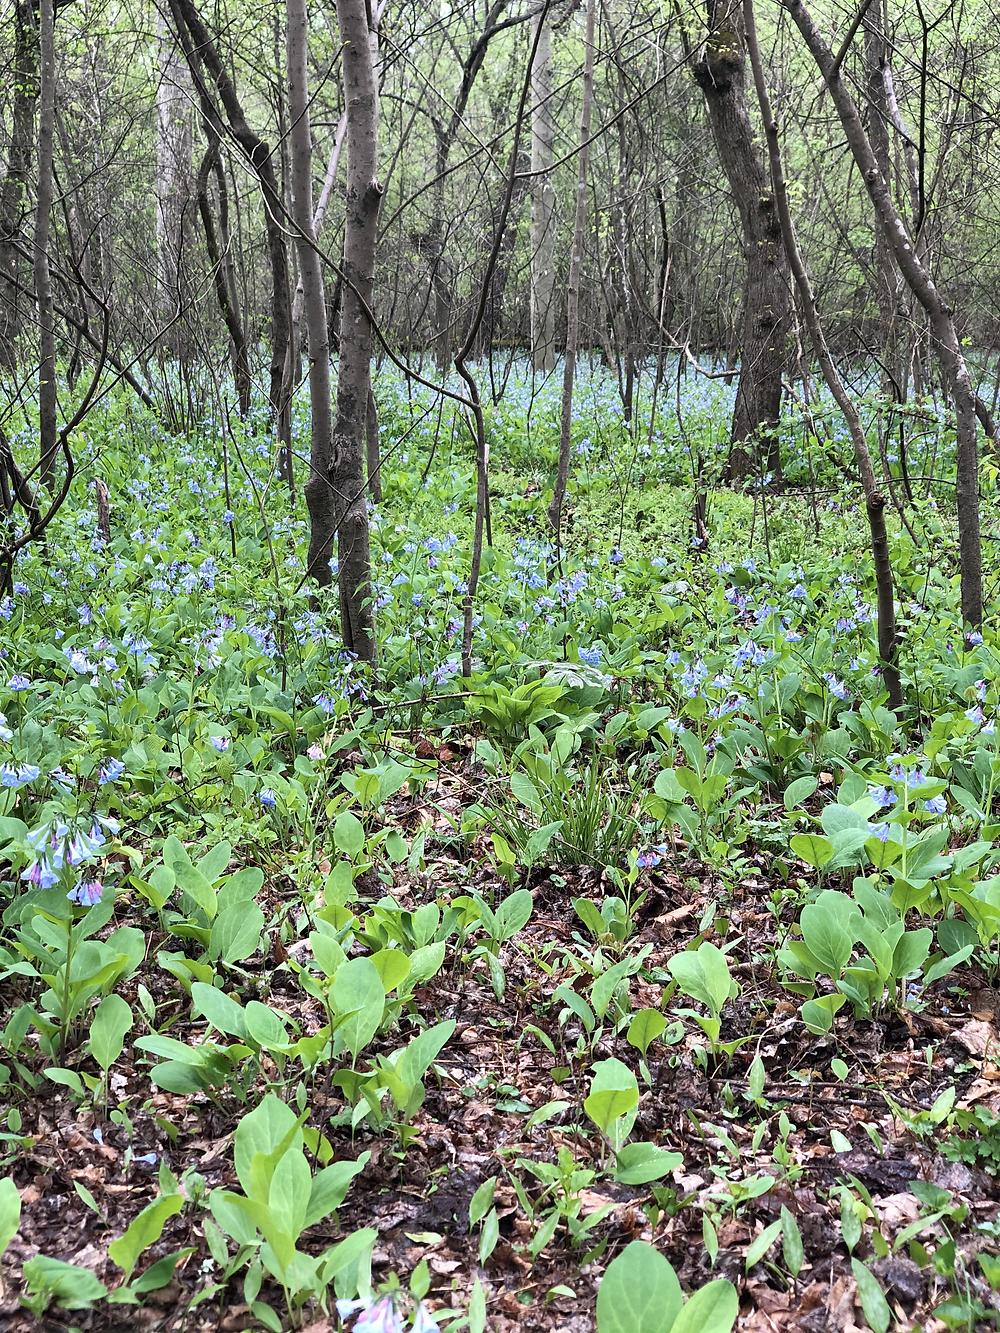 Carpet of native Virginia bluebells in Rock Creek Park